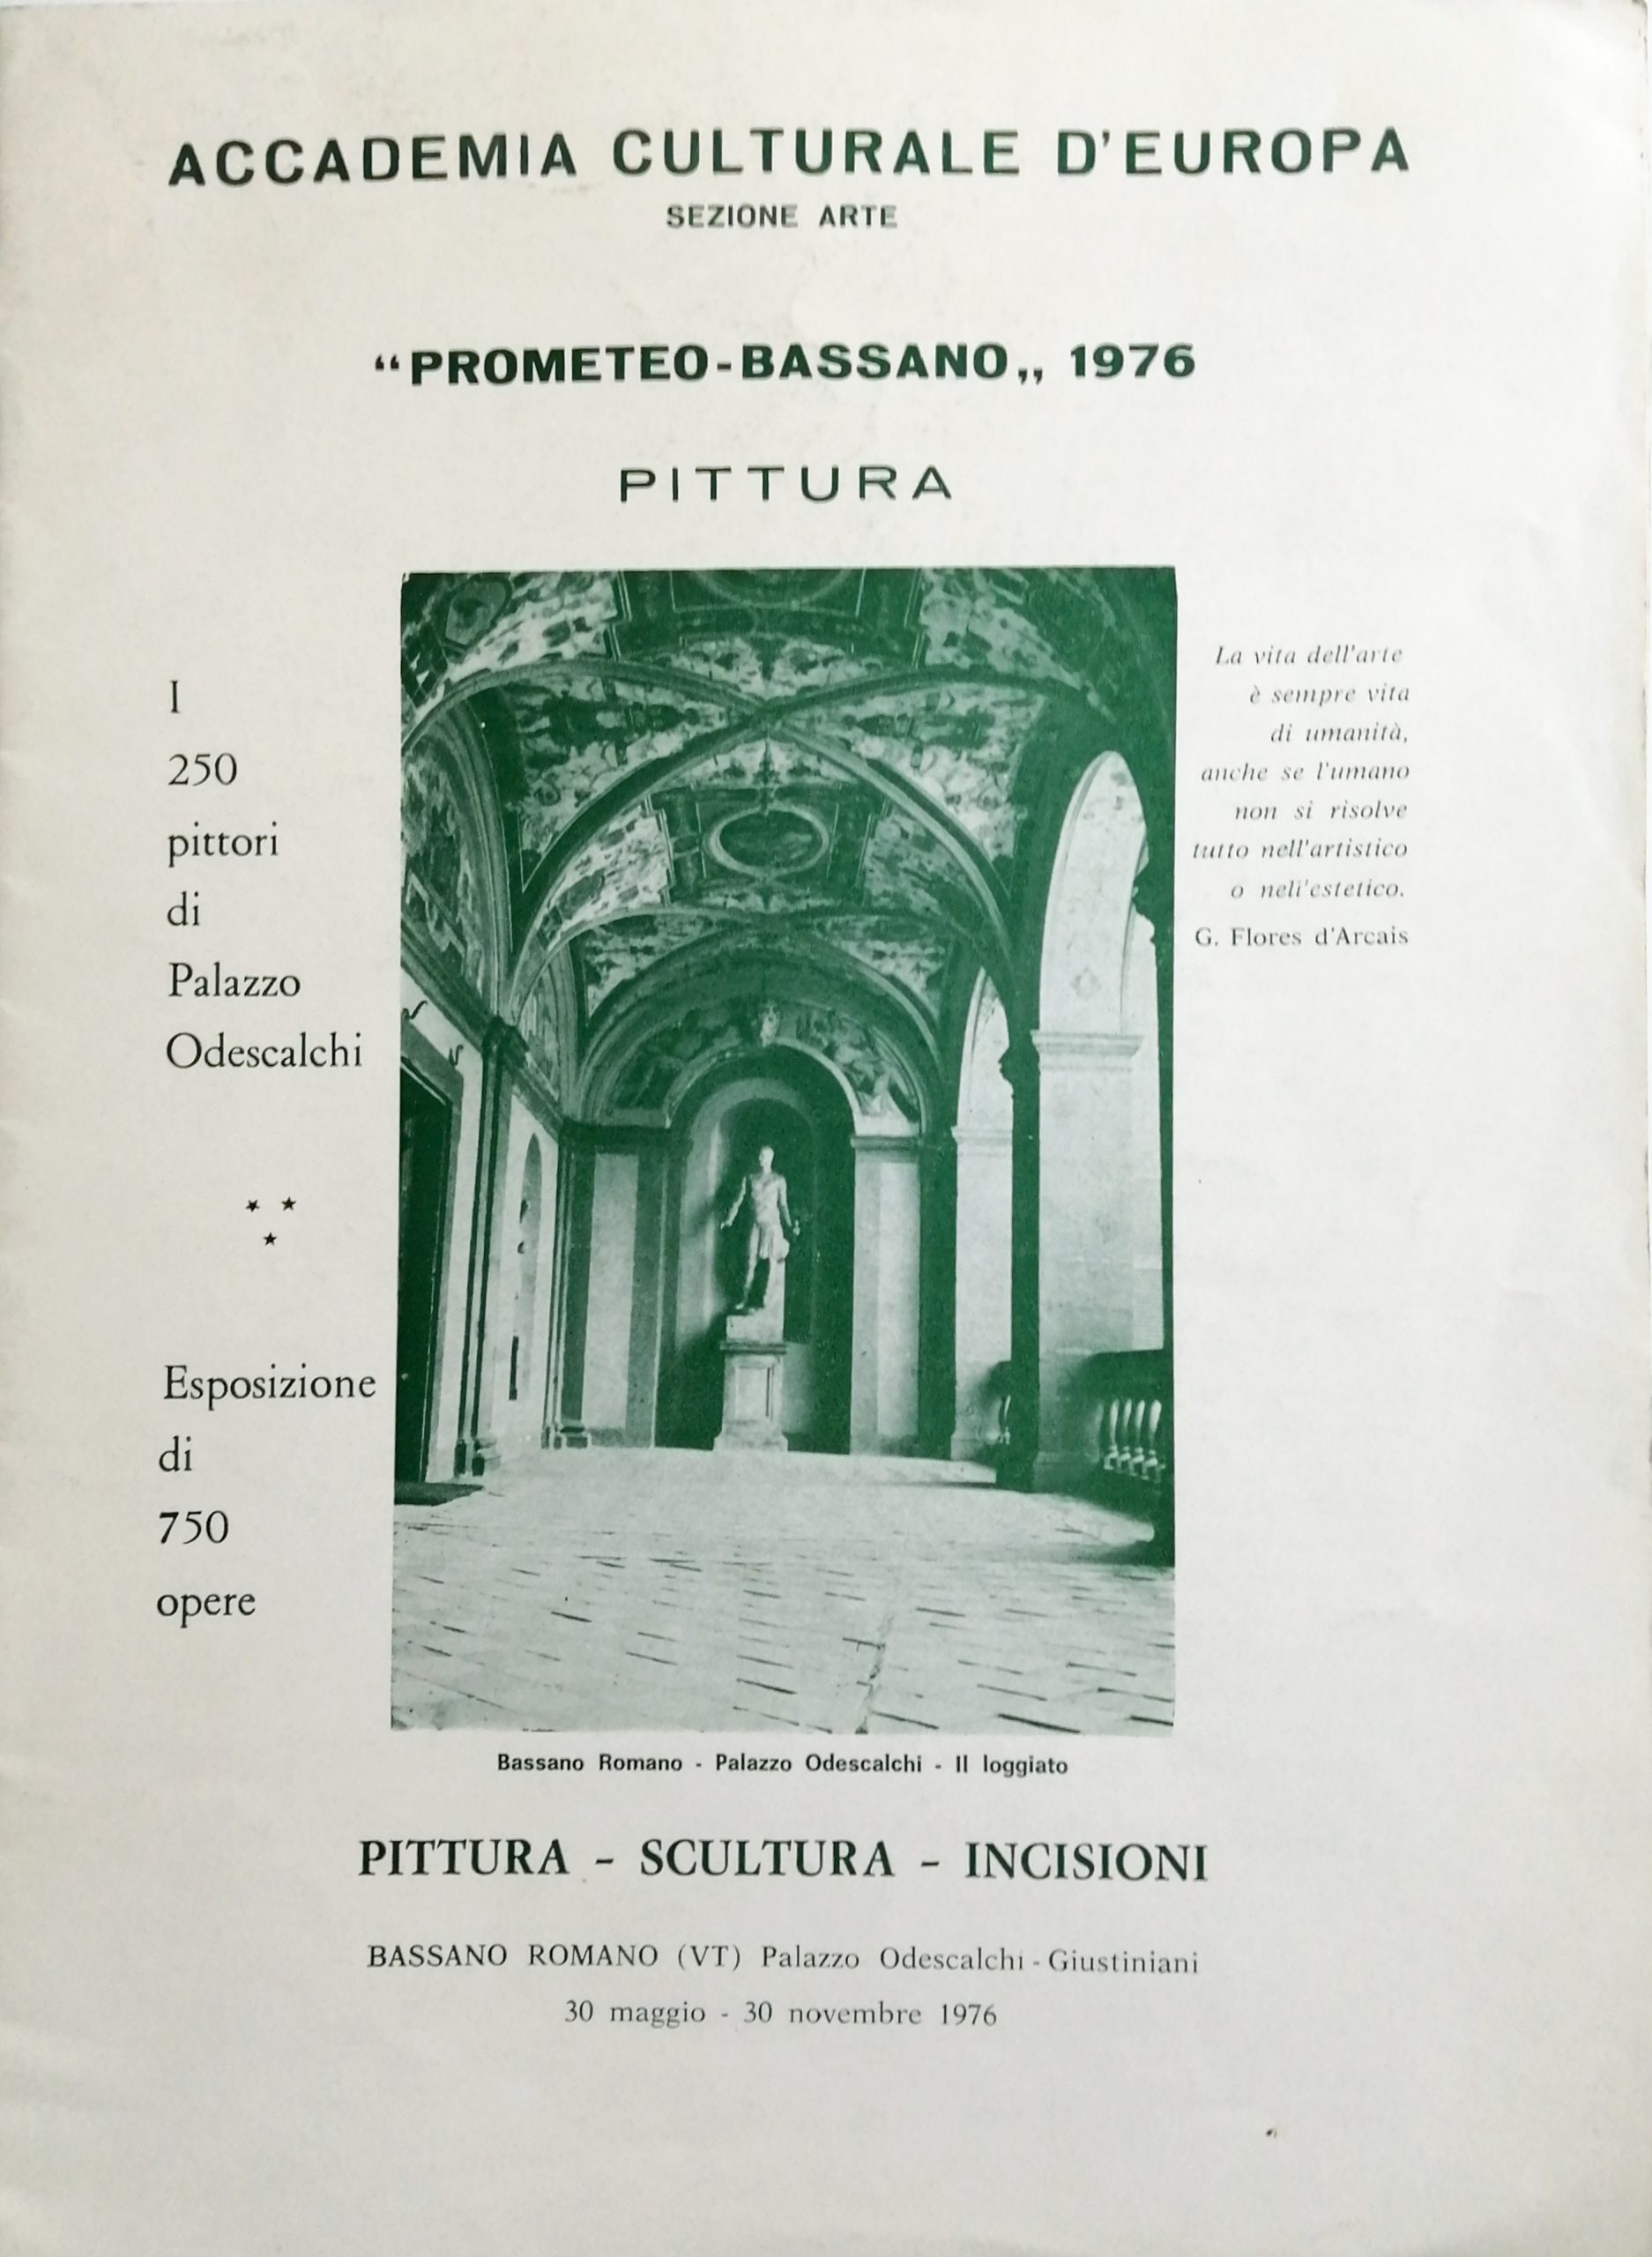 1976 Prometeo Bassano Palazzo Odescalchi Bassano Romano scaled - Bibliography/ Catalogues